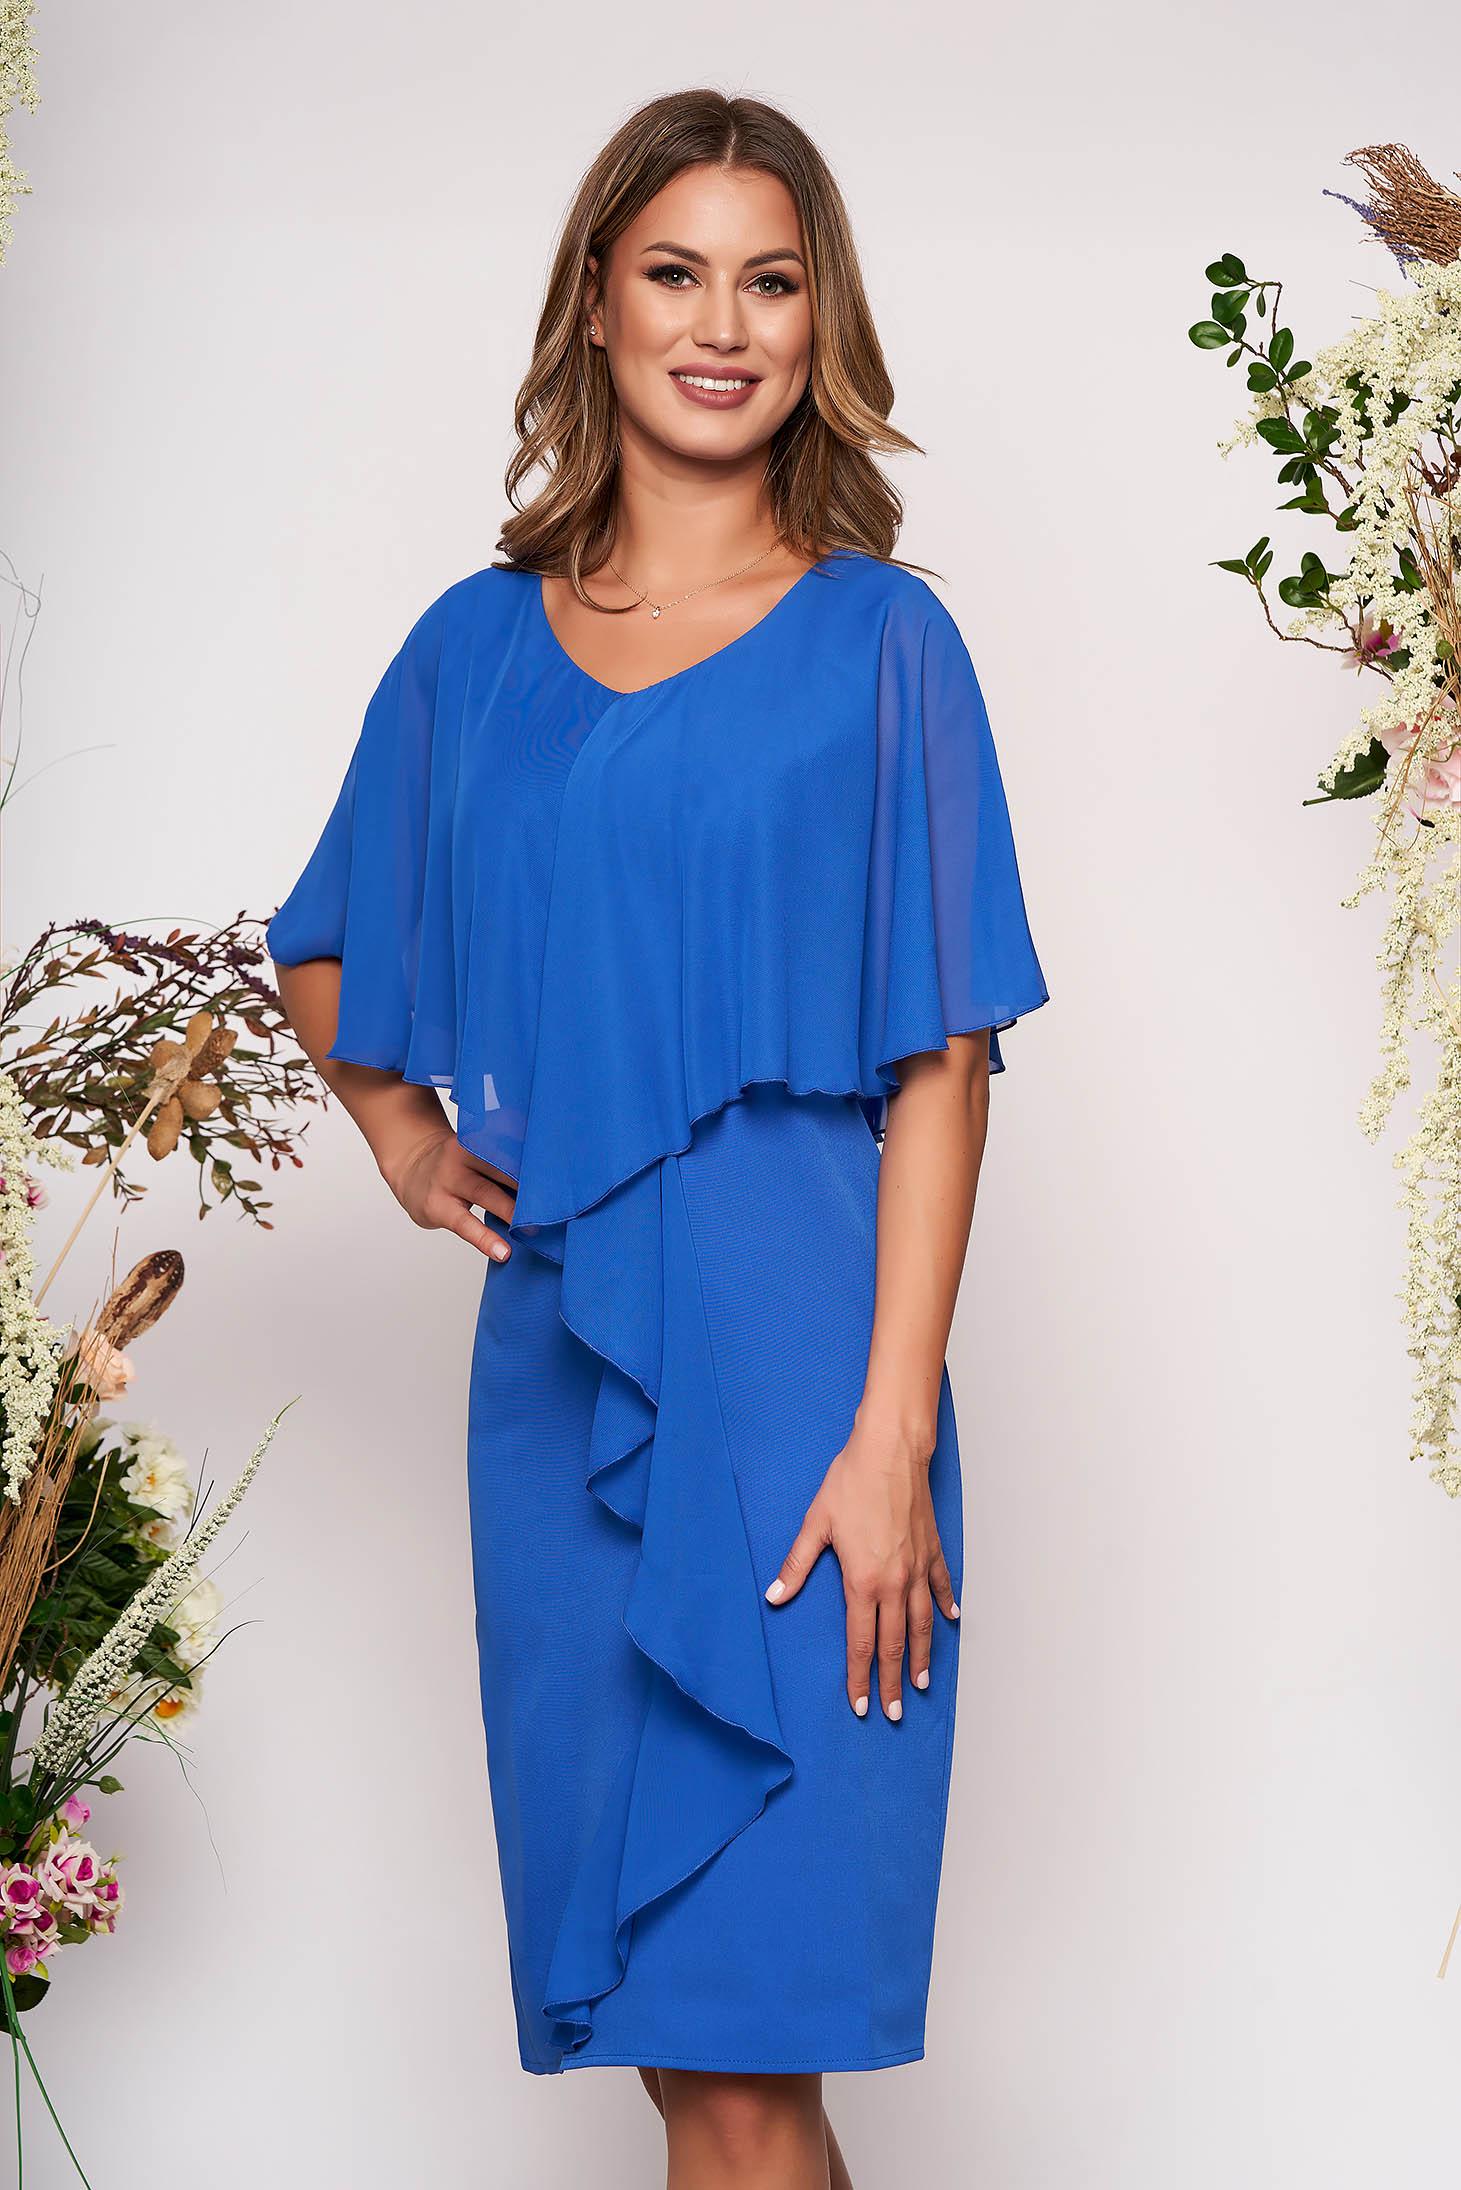 Rochie albastra midi de ocazie fara maneci cu un croi cambrat din stofa subtire usor elastica si suprapunere cu voal